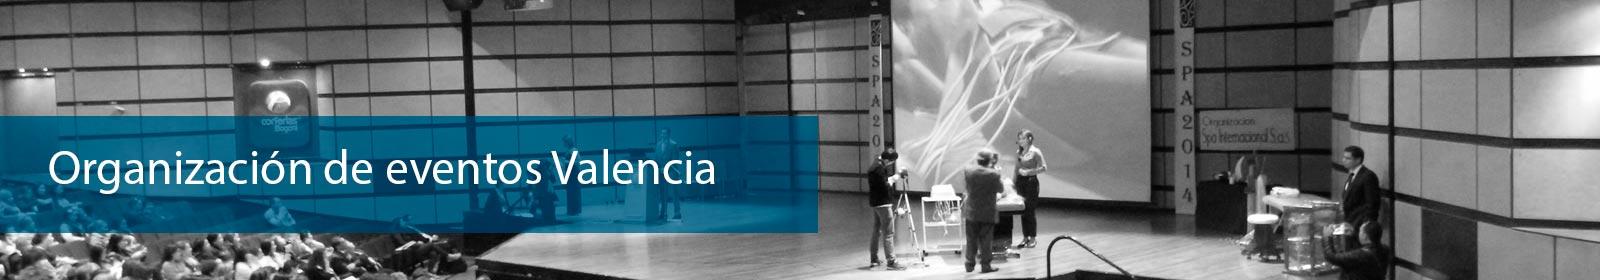 Organizacion de eventos Valencia con R.Guarnido